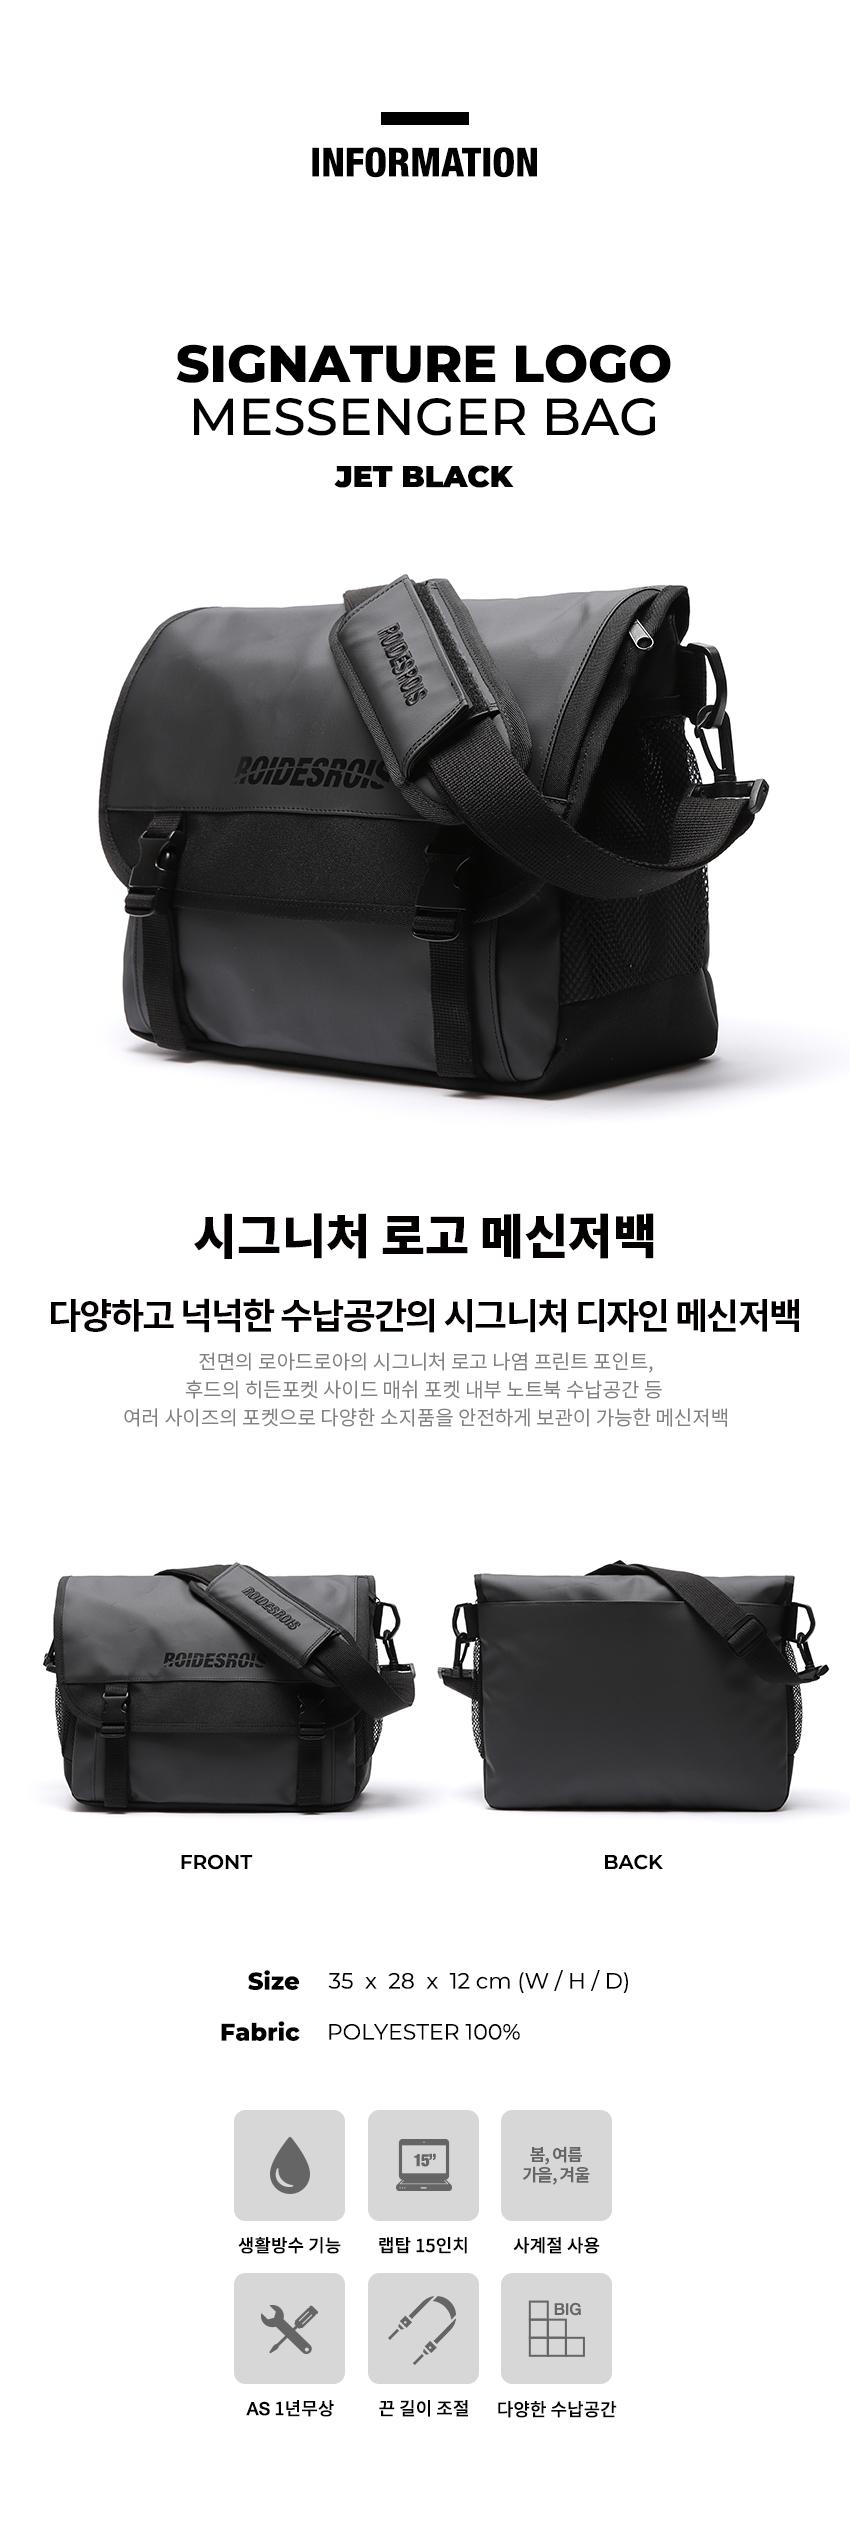 SIGNATURE LOGO MESSENGER BAG (JET BLACK)